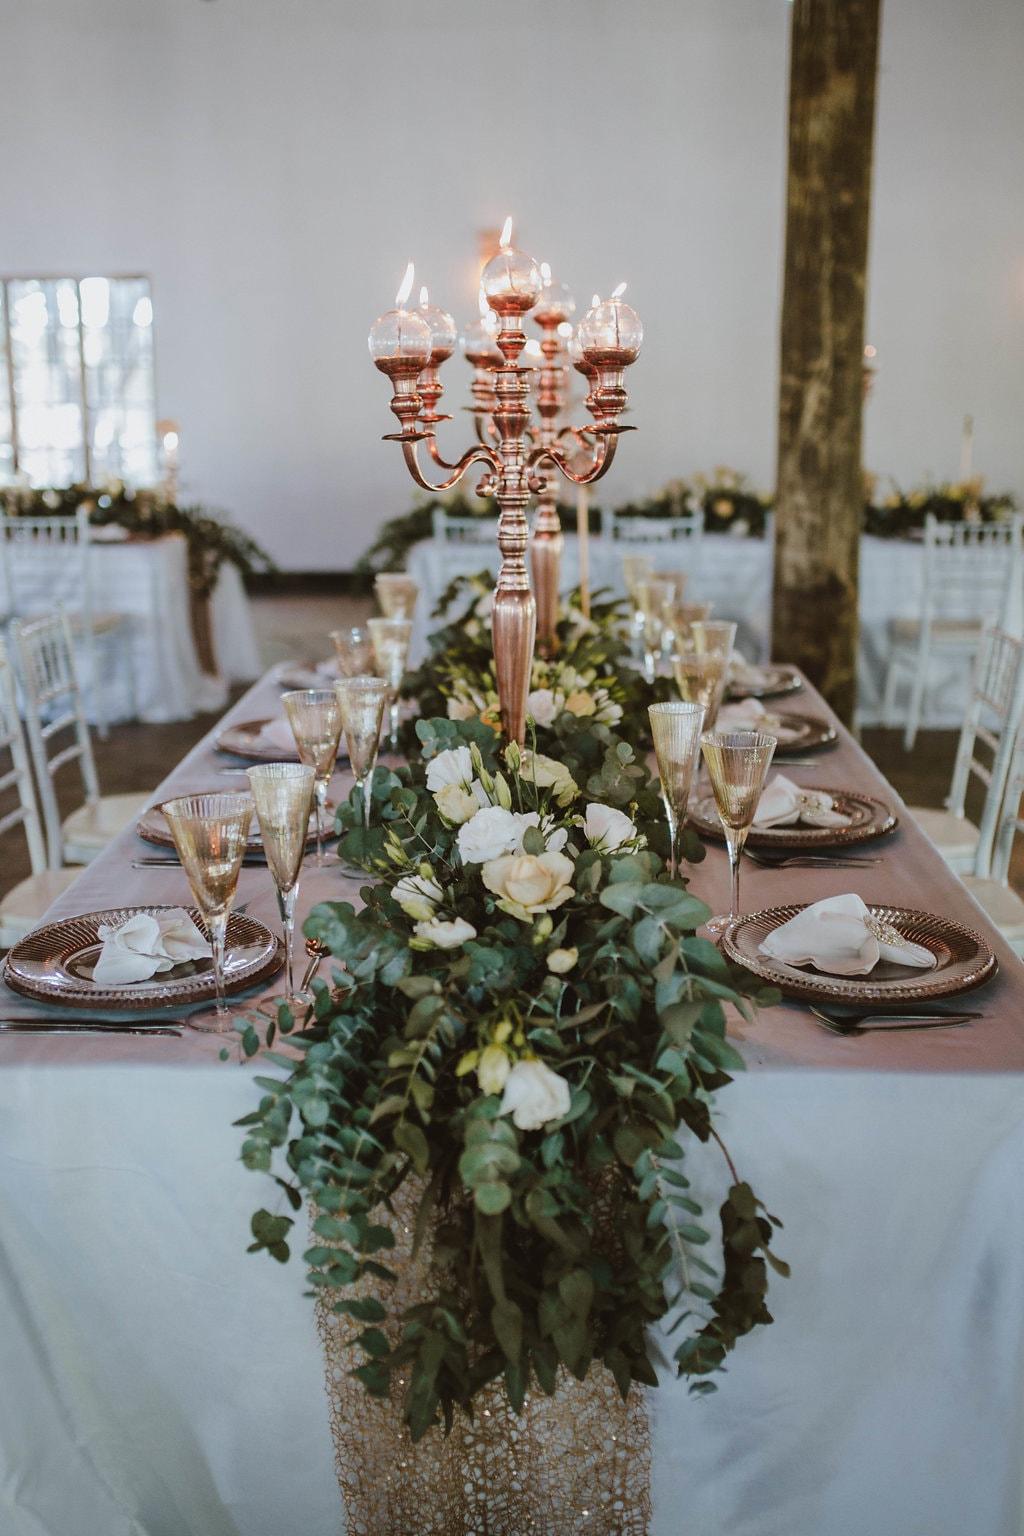 Sequin Linens & Rose Gold Candelabra | Image: Jessica J Photography